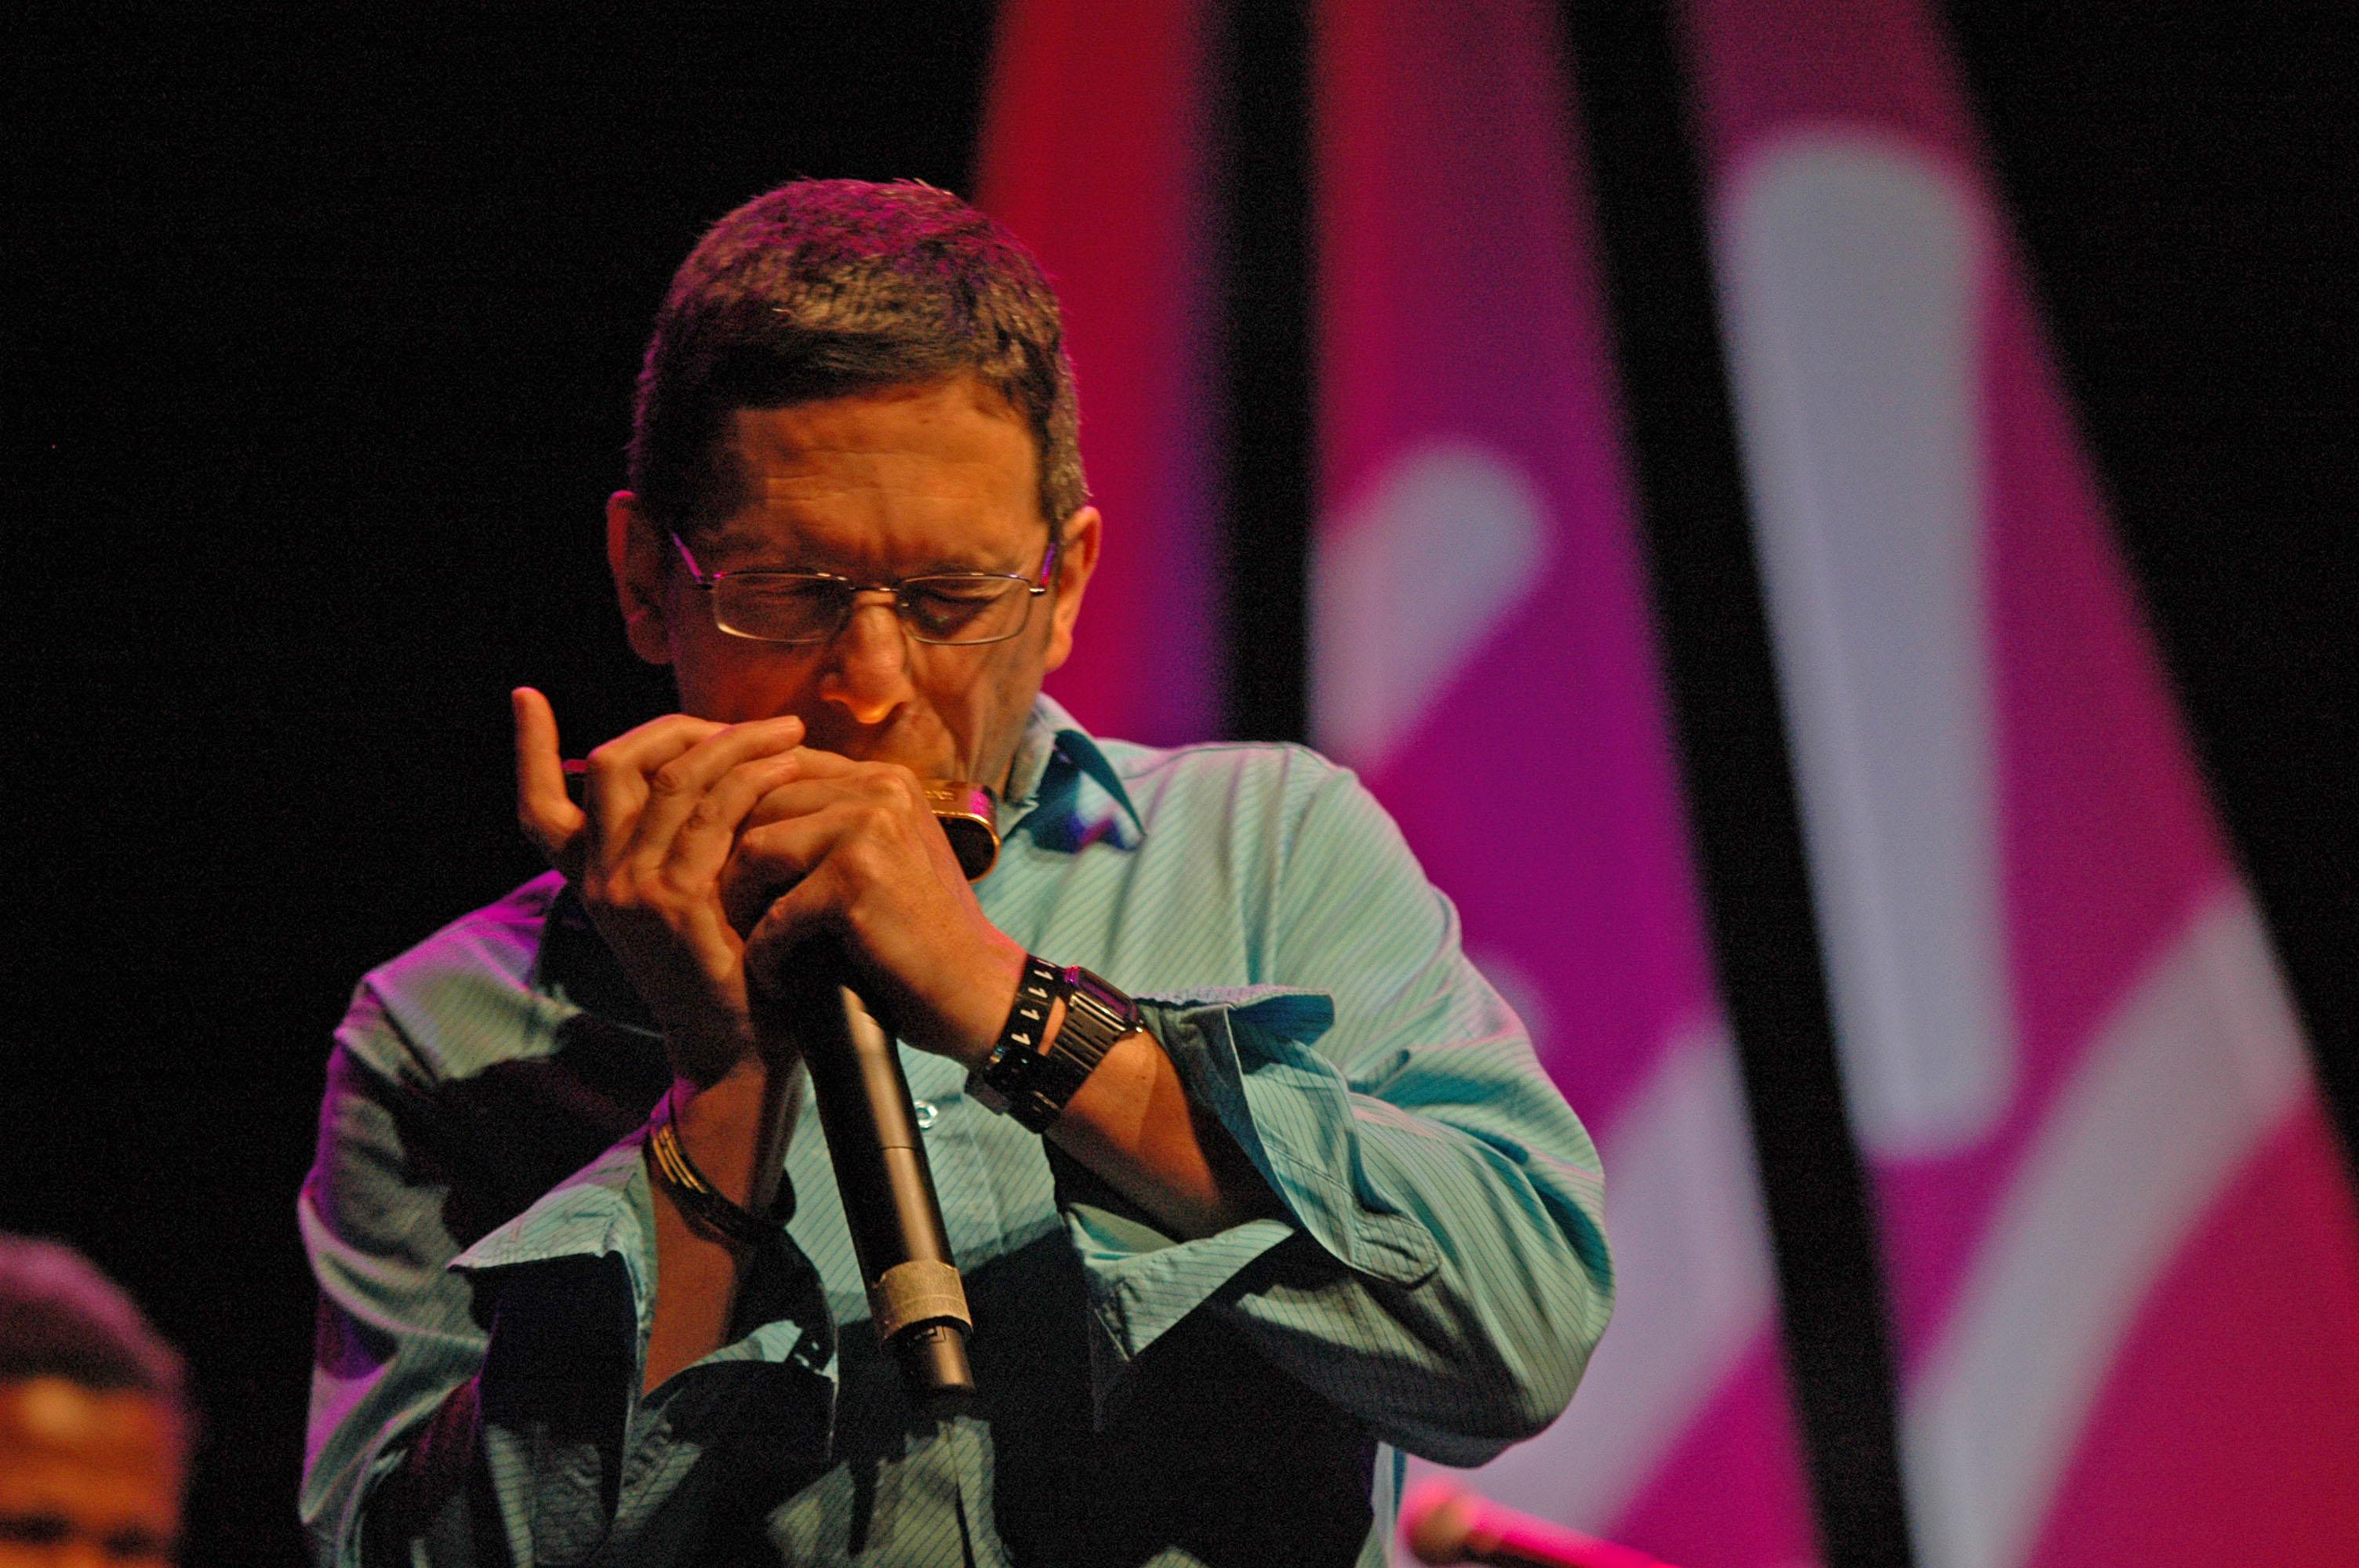 Adam Glasser, Cape Town Jazz Festival 2012